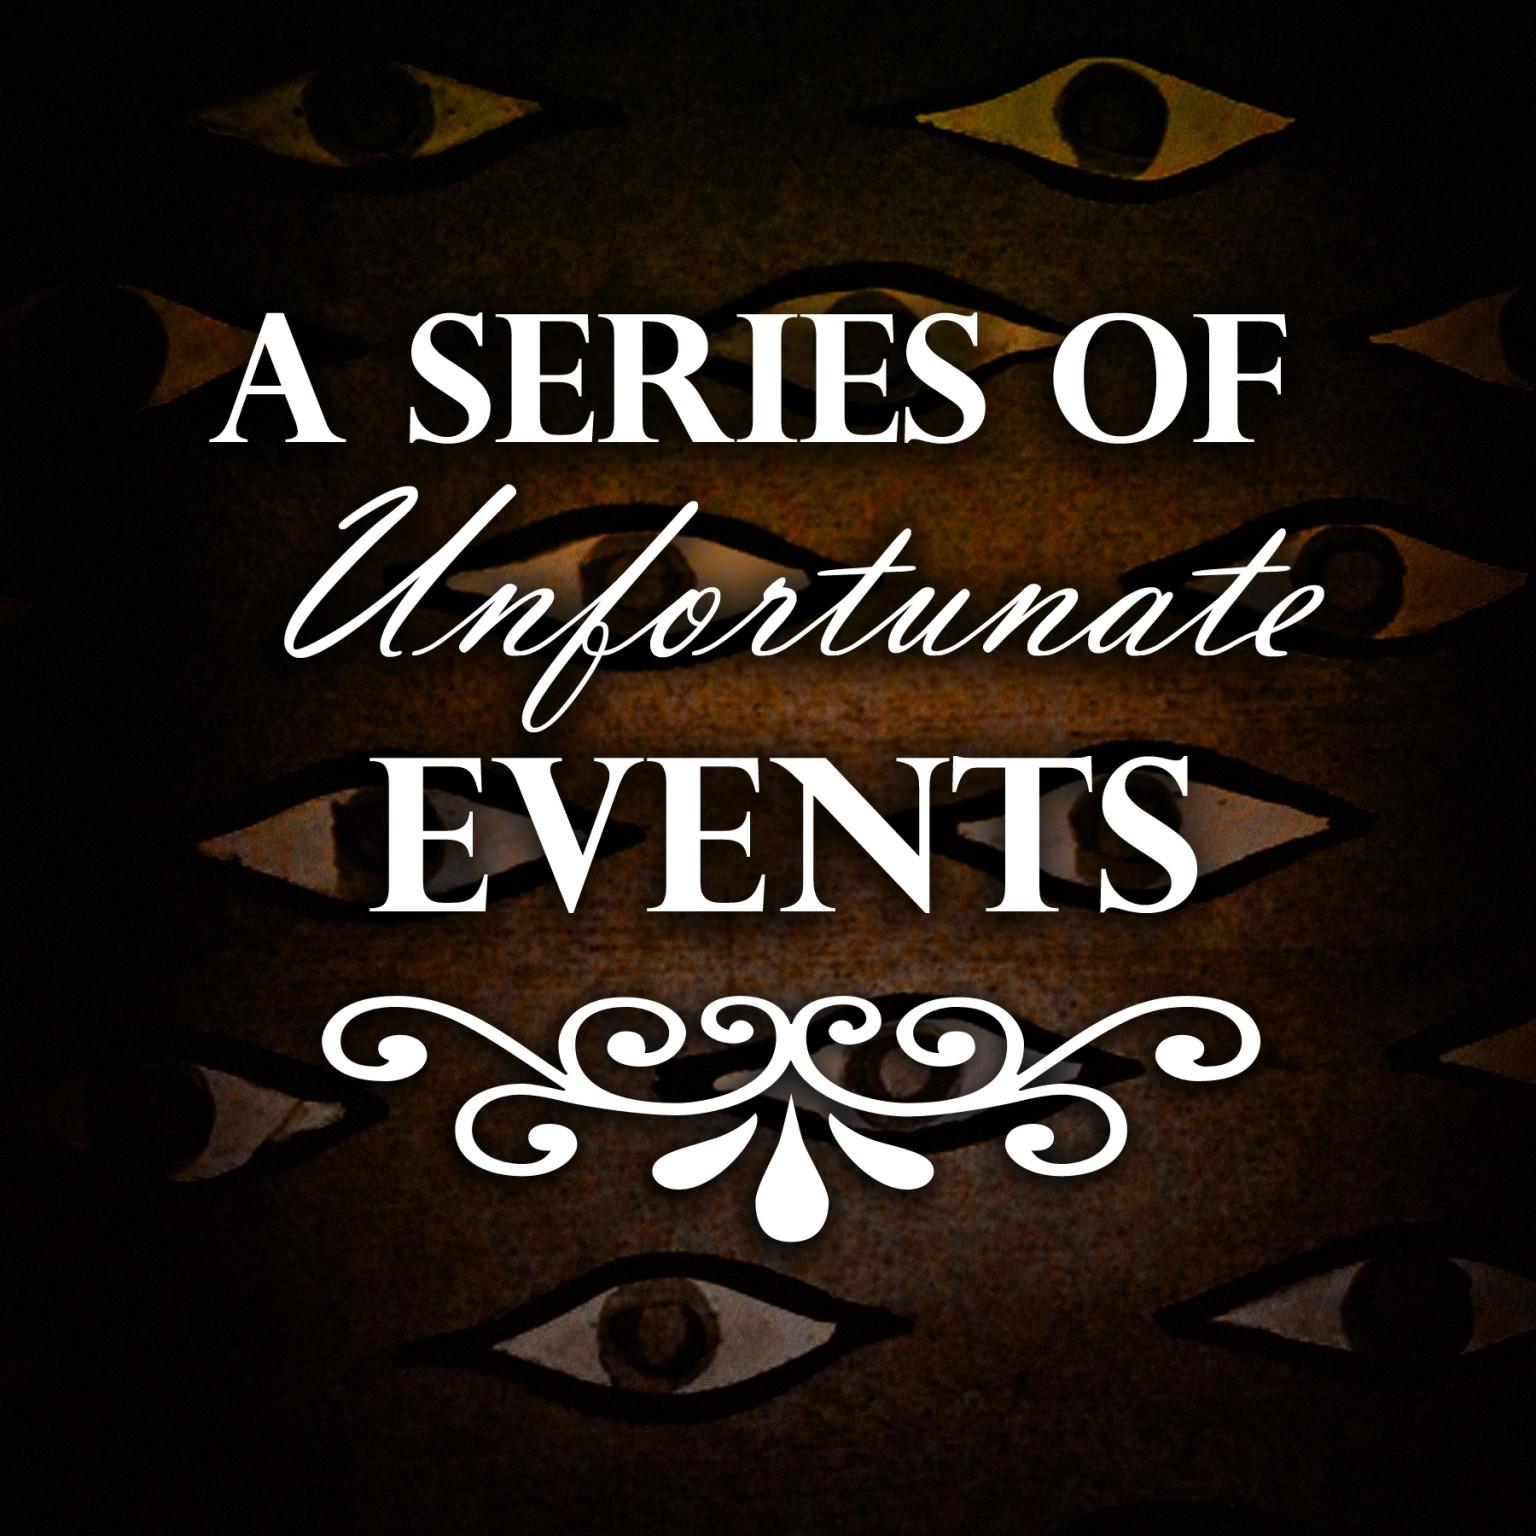 7 Unfortunate Events